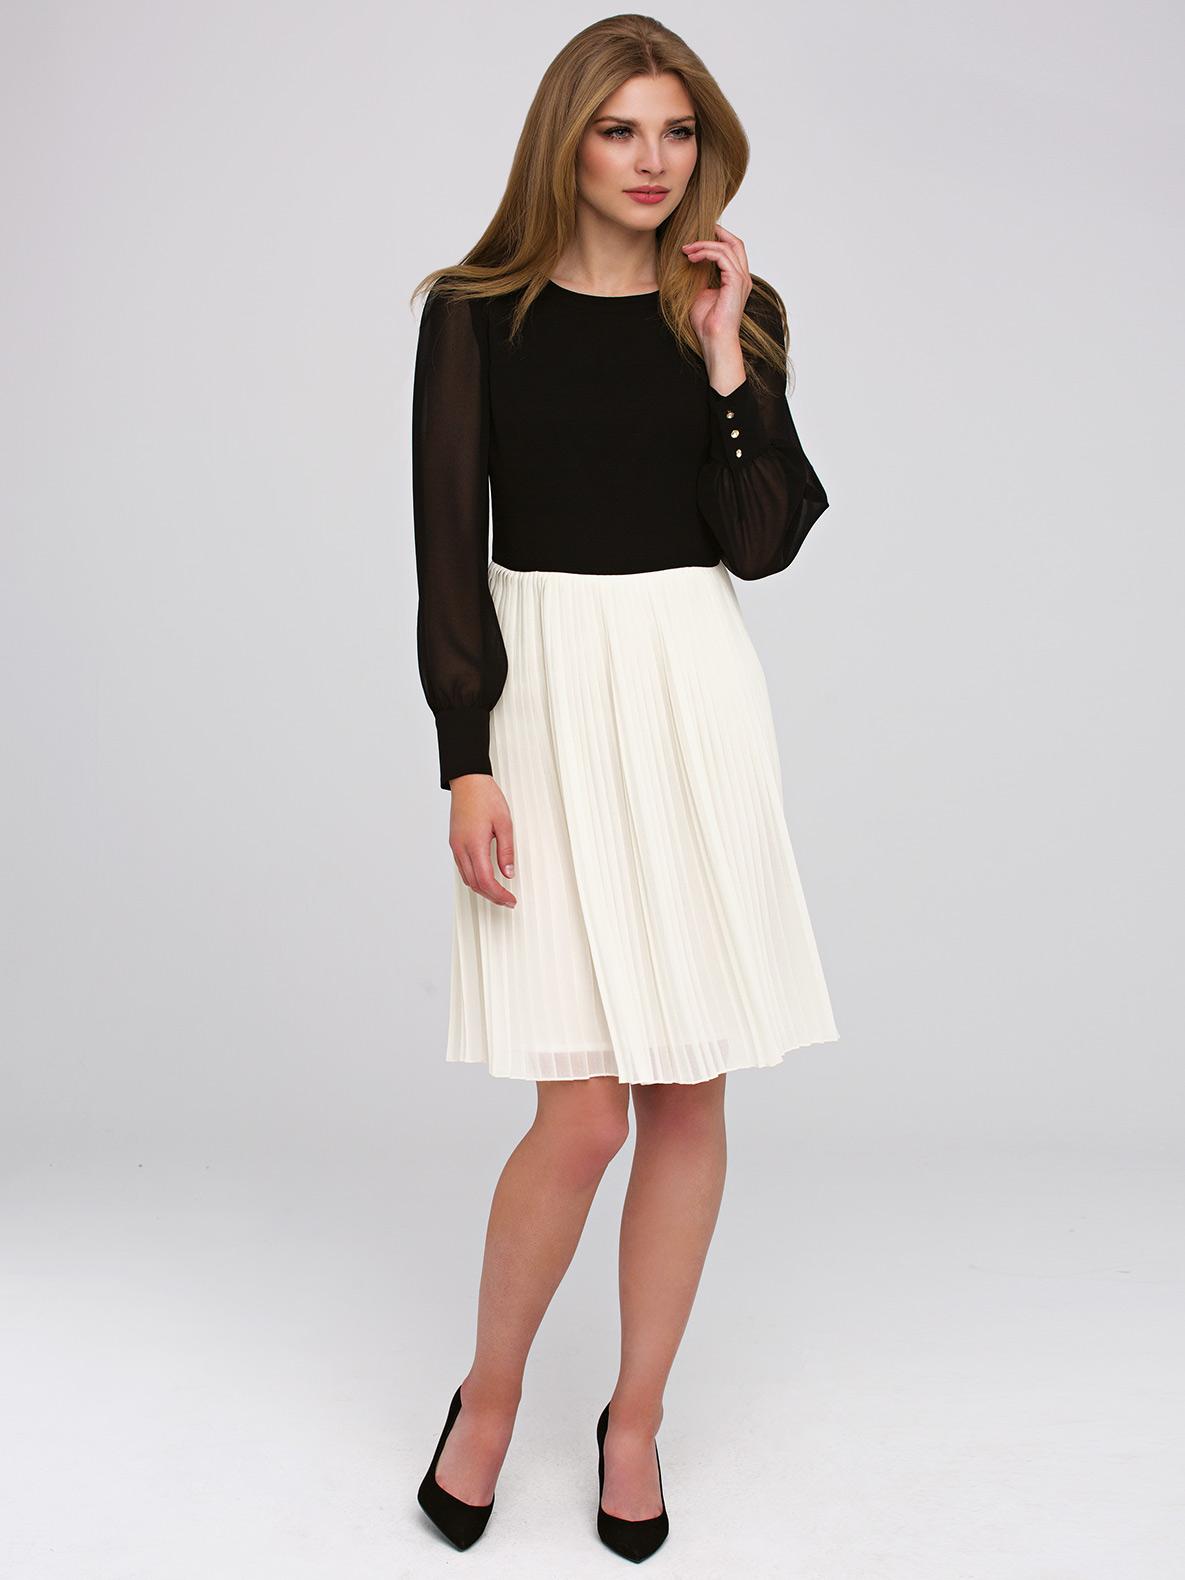 Dress Hemma